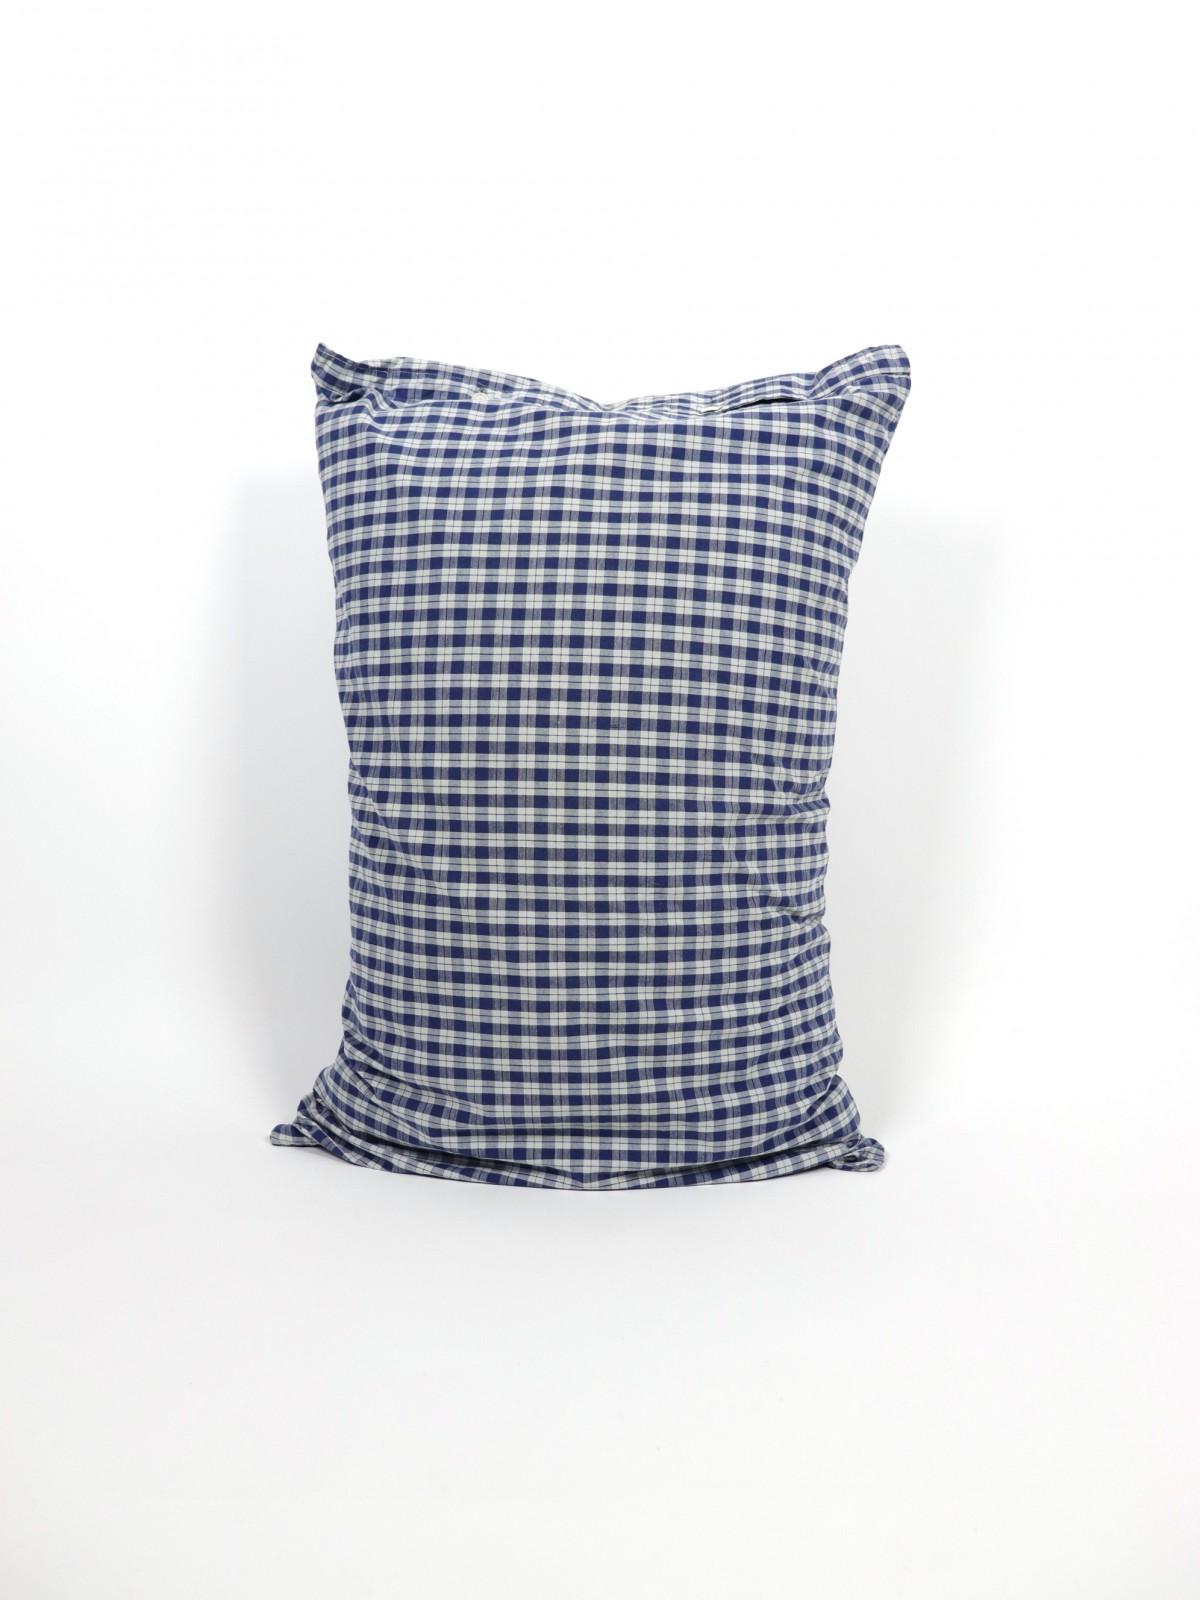 German fabric 、CHECK、Cotton 100%、Cushion